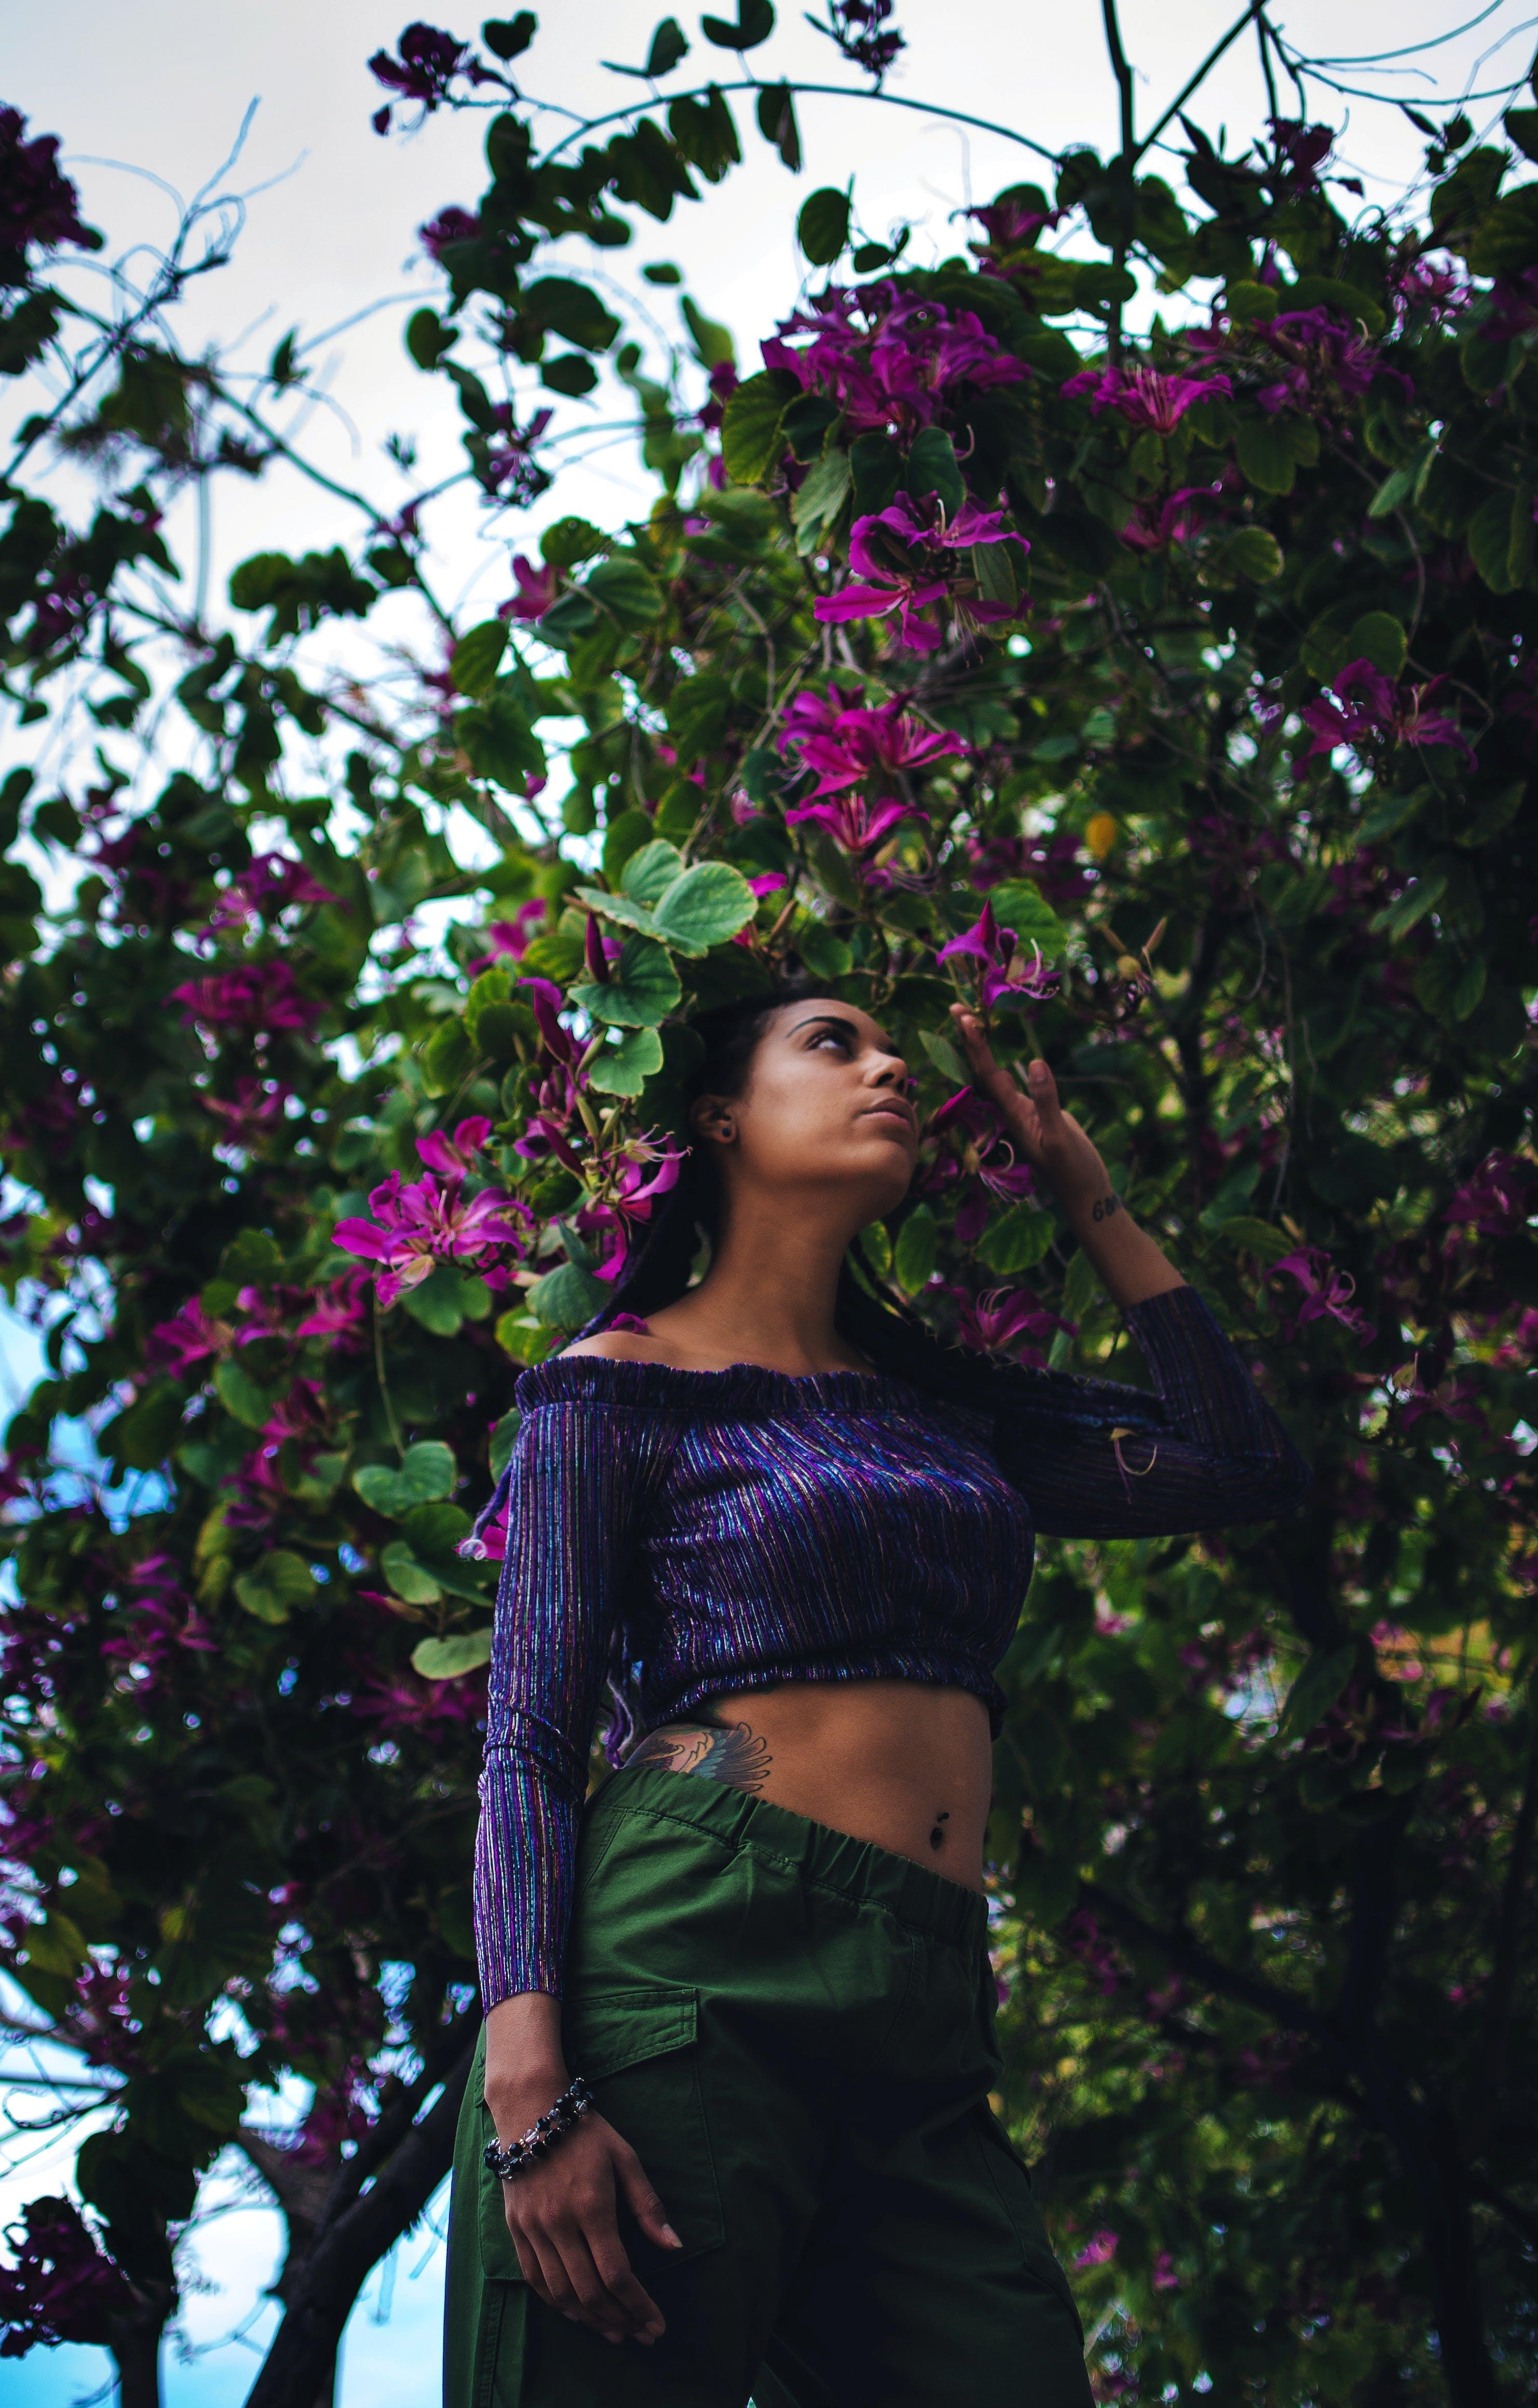 Woman Holding Purple-Petaled Flowers